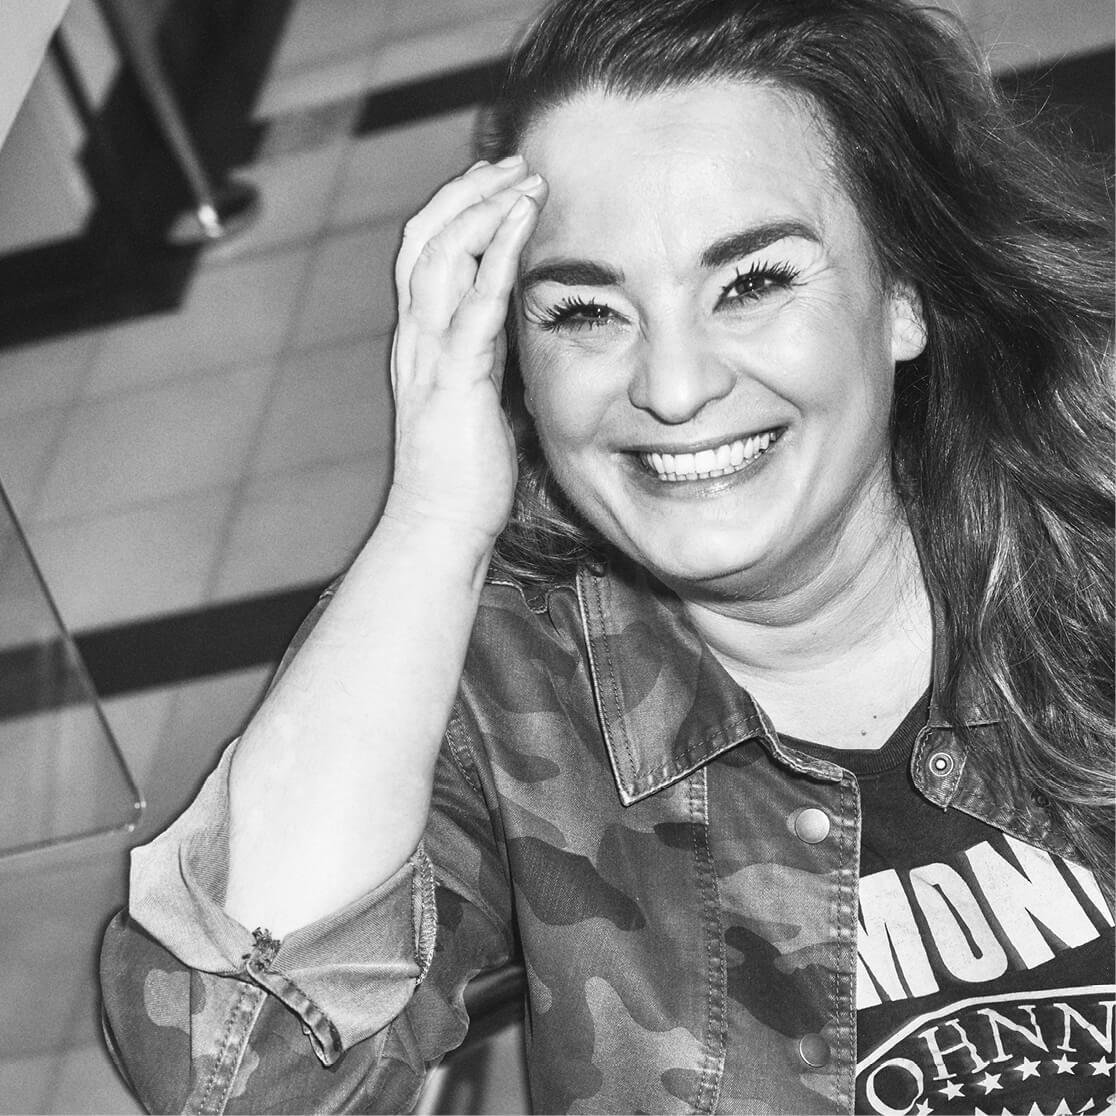 Joanna Jędrejek